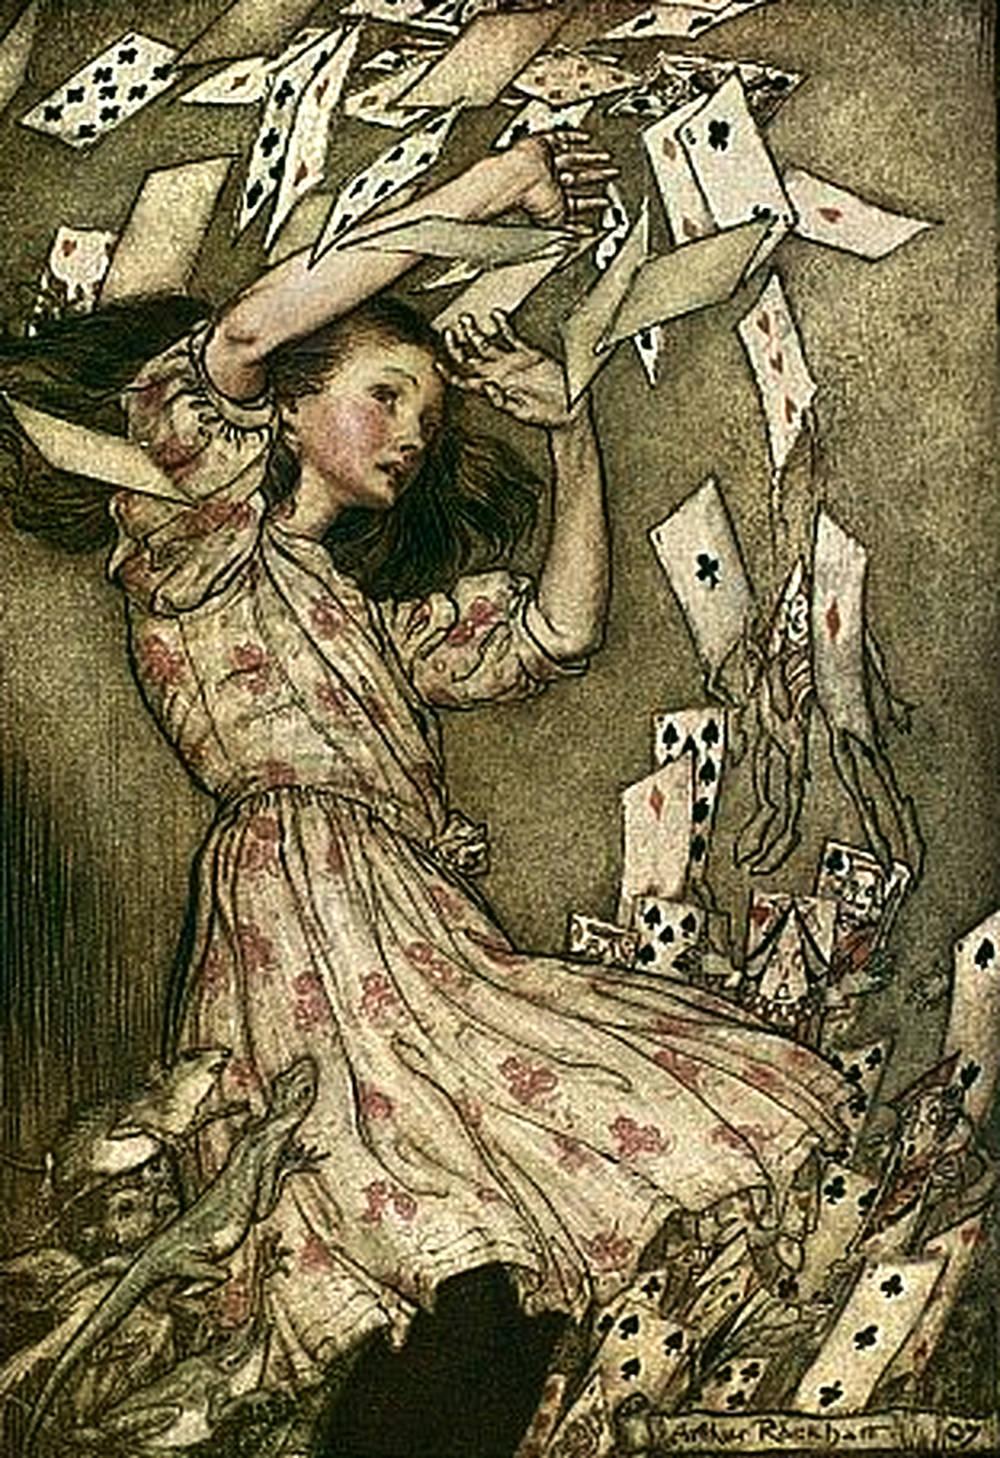 Cards Attack Alice Adventures in Wonderland